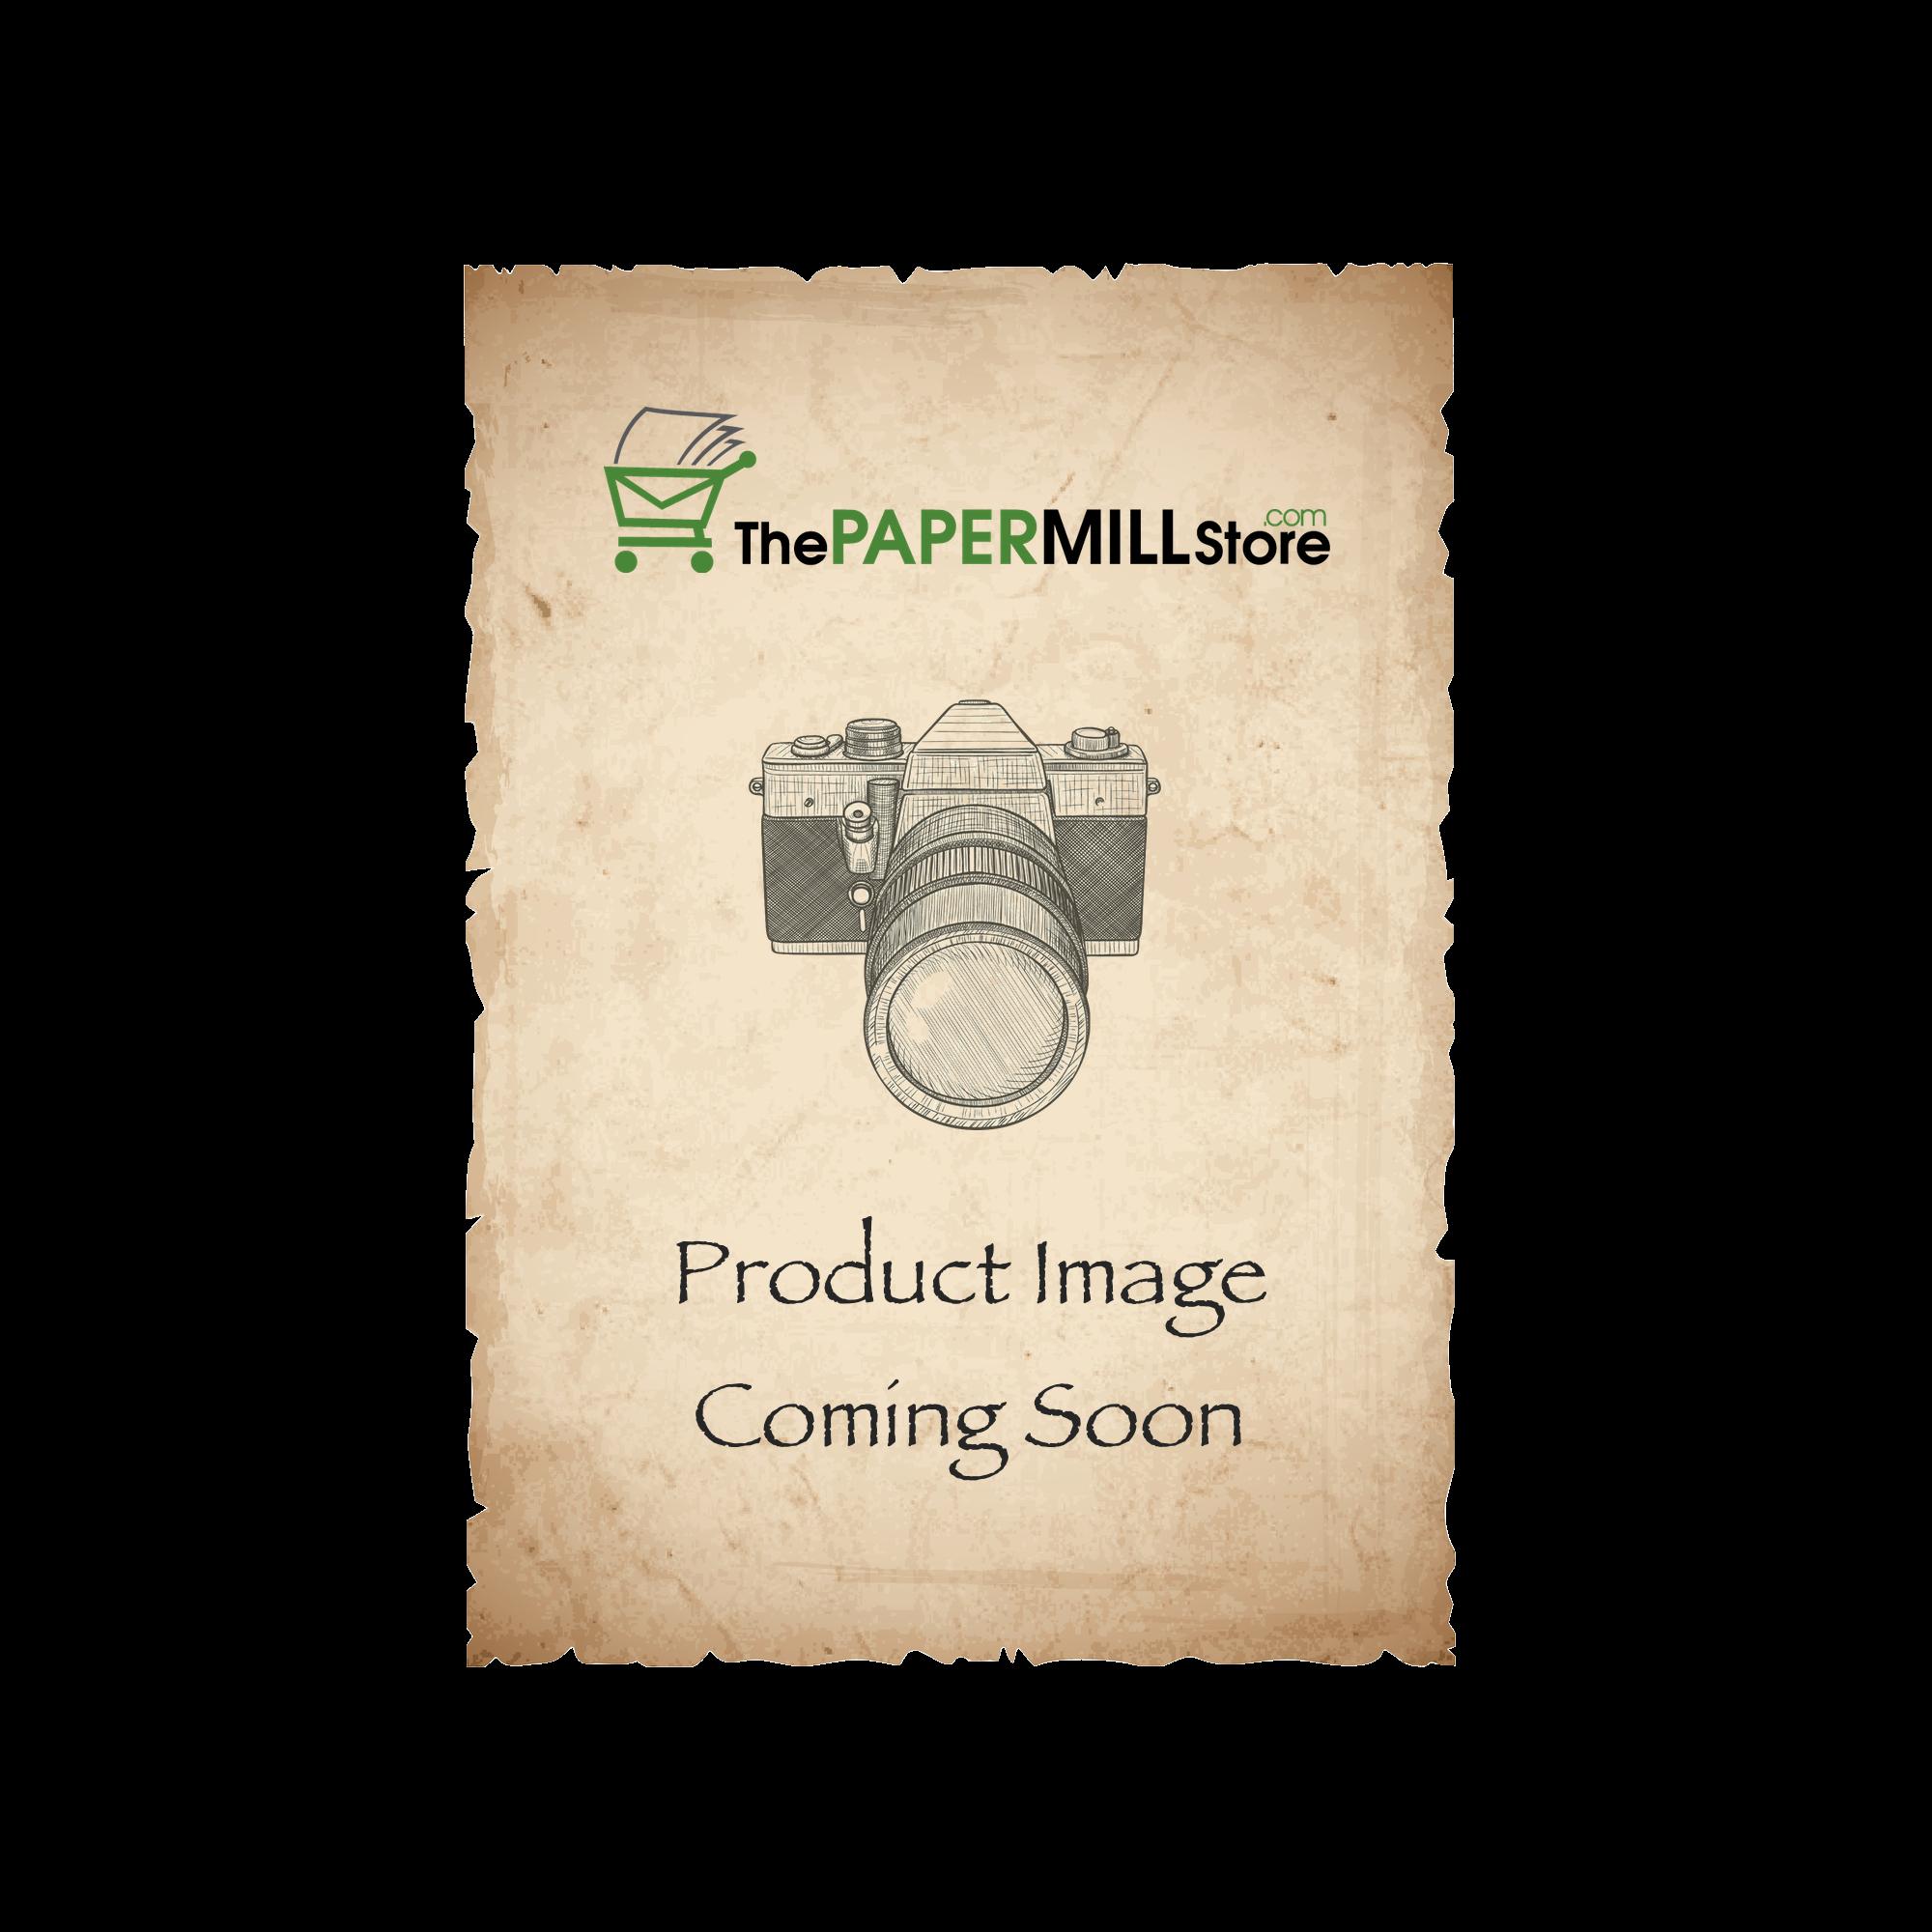 Ultrafelt Cool White Envelopes - A2 (4 3/8 x 5 3/4) 80 lb Text Premium Felt  30% Recycled 1000 per Carton